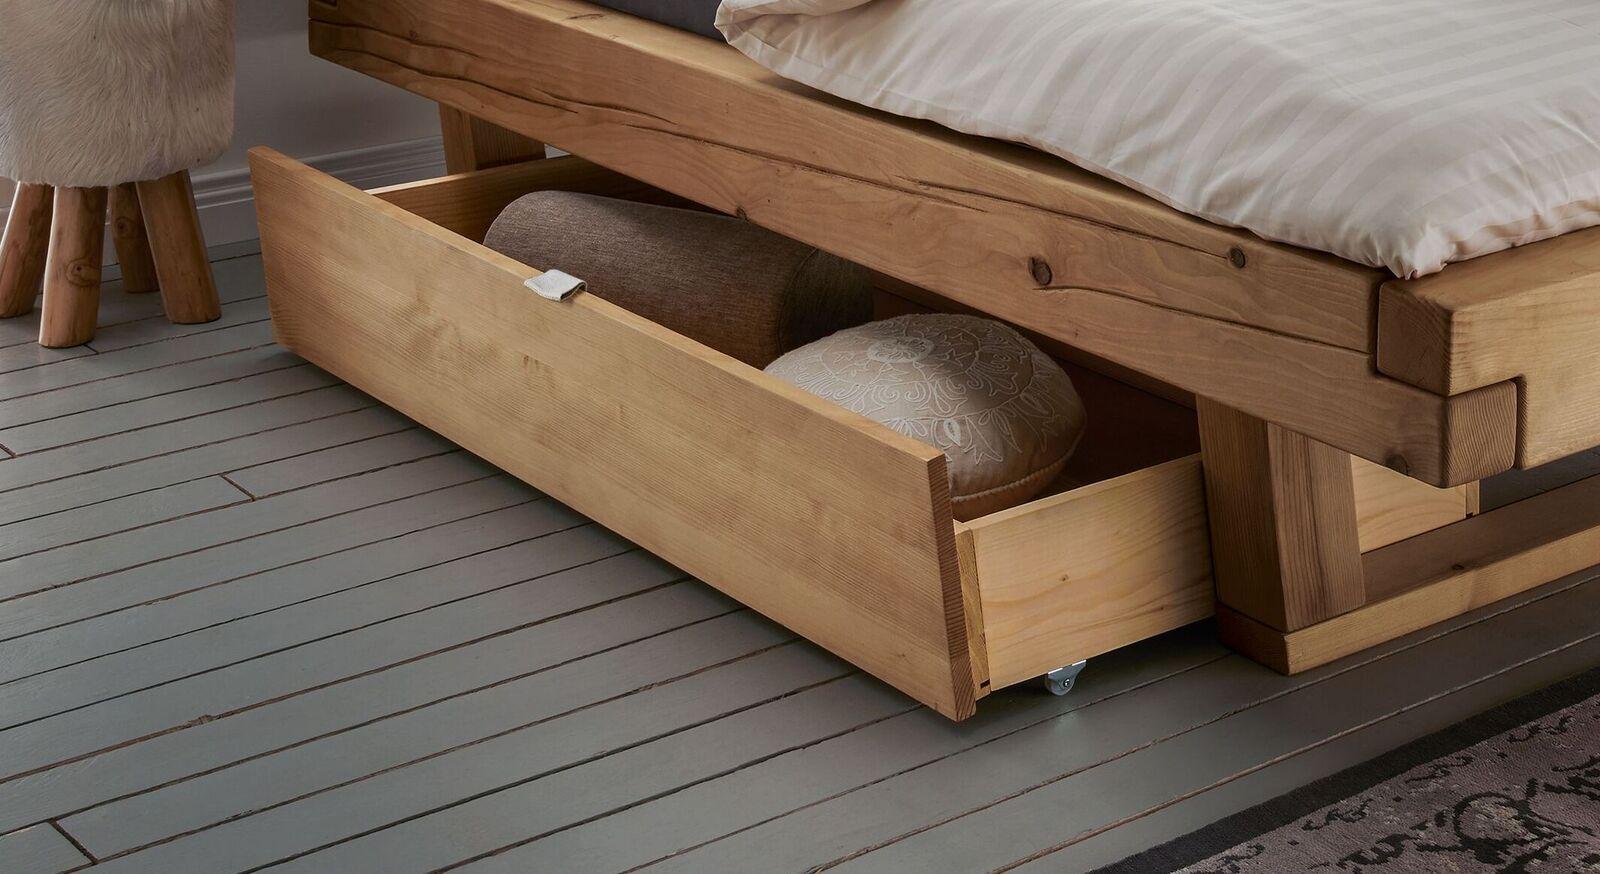 Bett-Schubkästen Basiliano aus robustem Fichtenholz